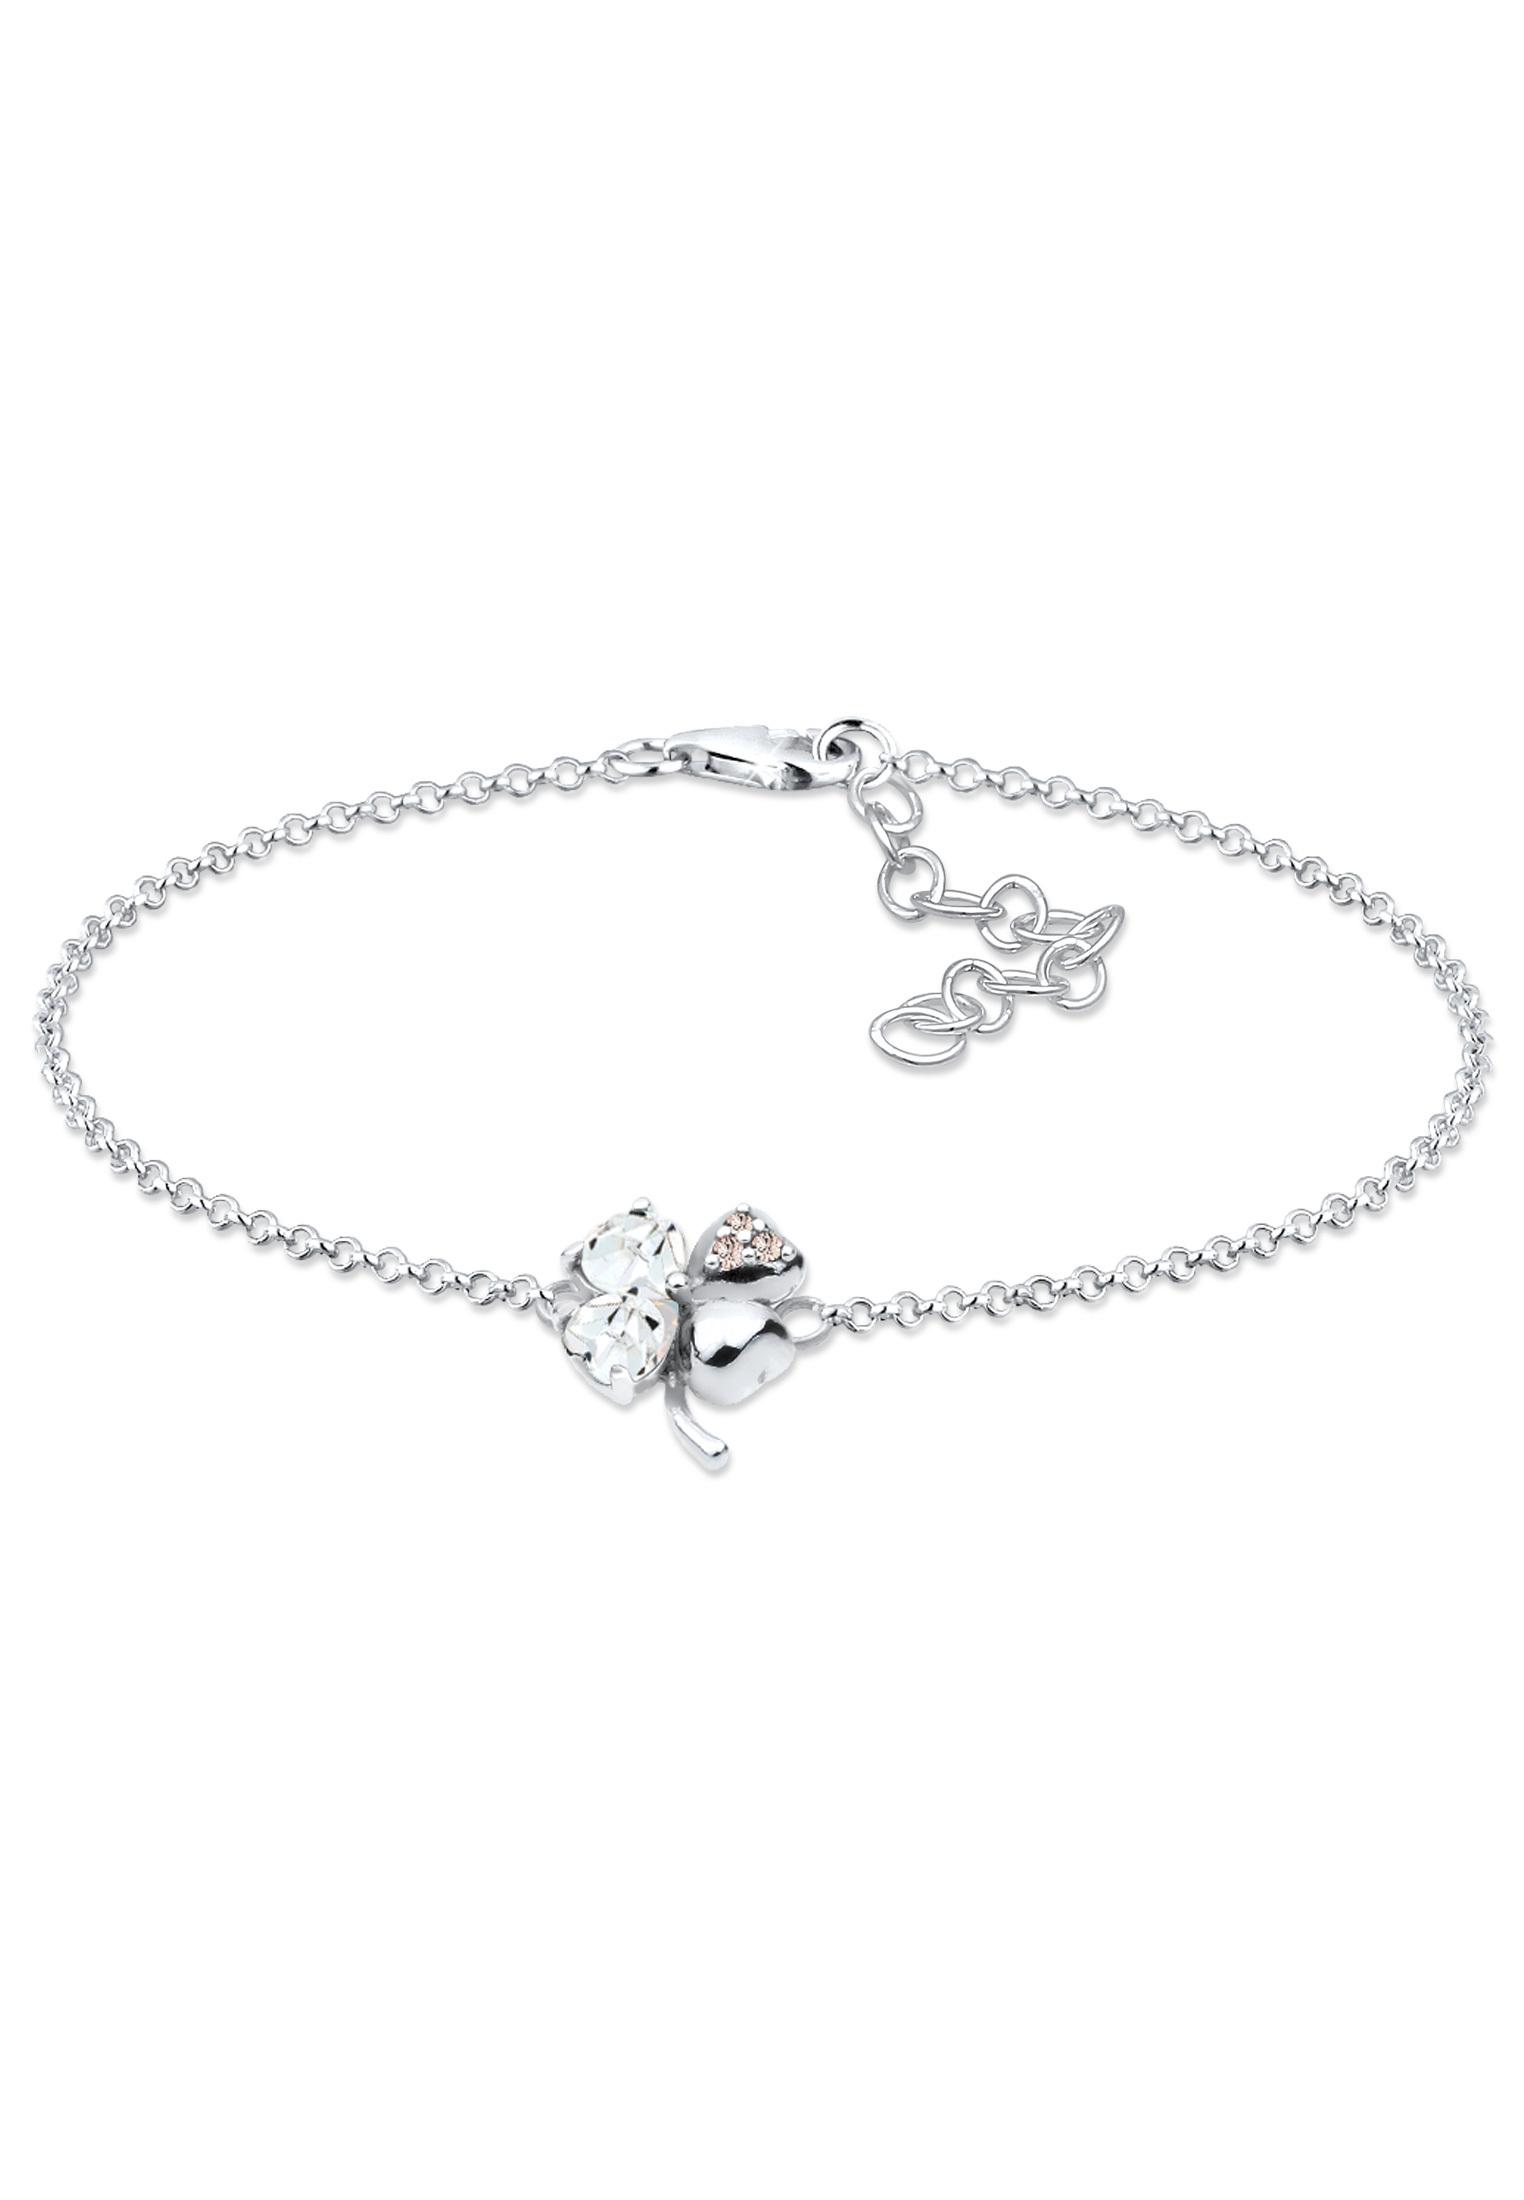 Armband Kleeblatt | Kristall ( Weiß ) | 925er Sterling Silber